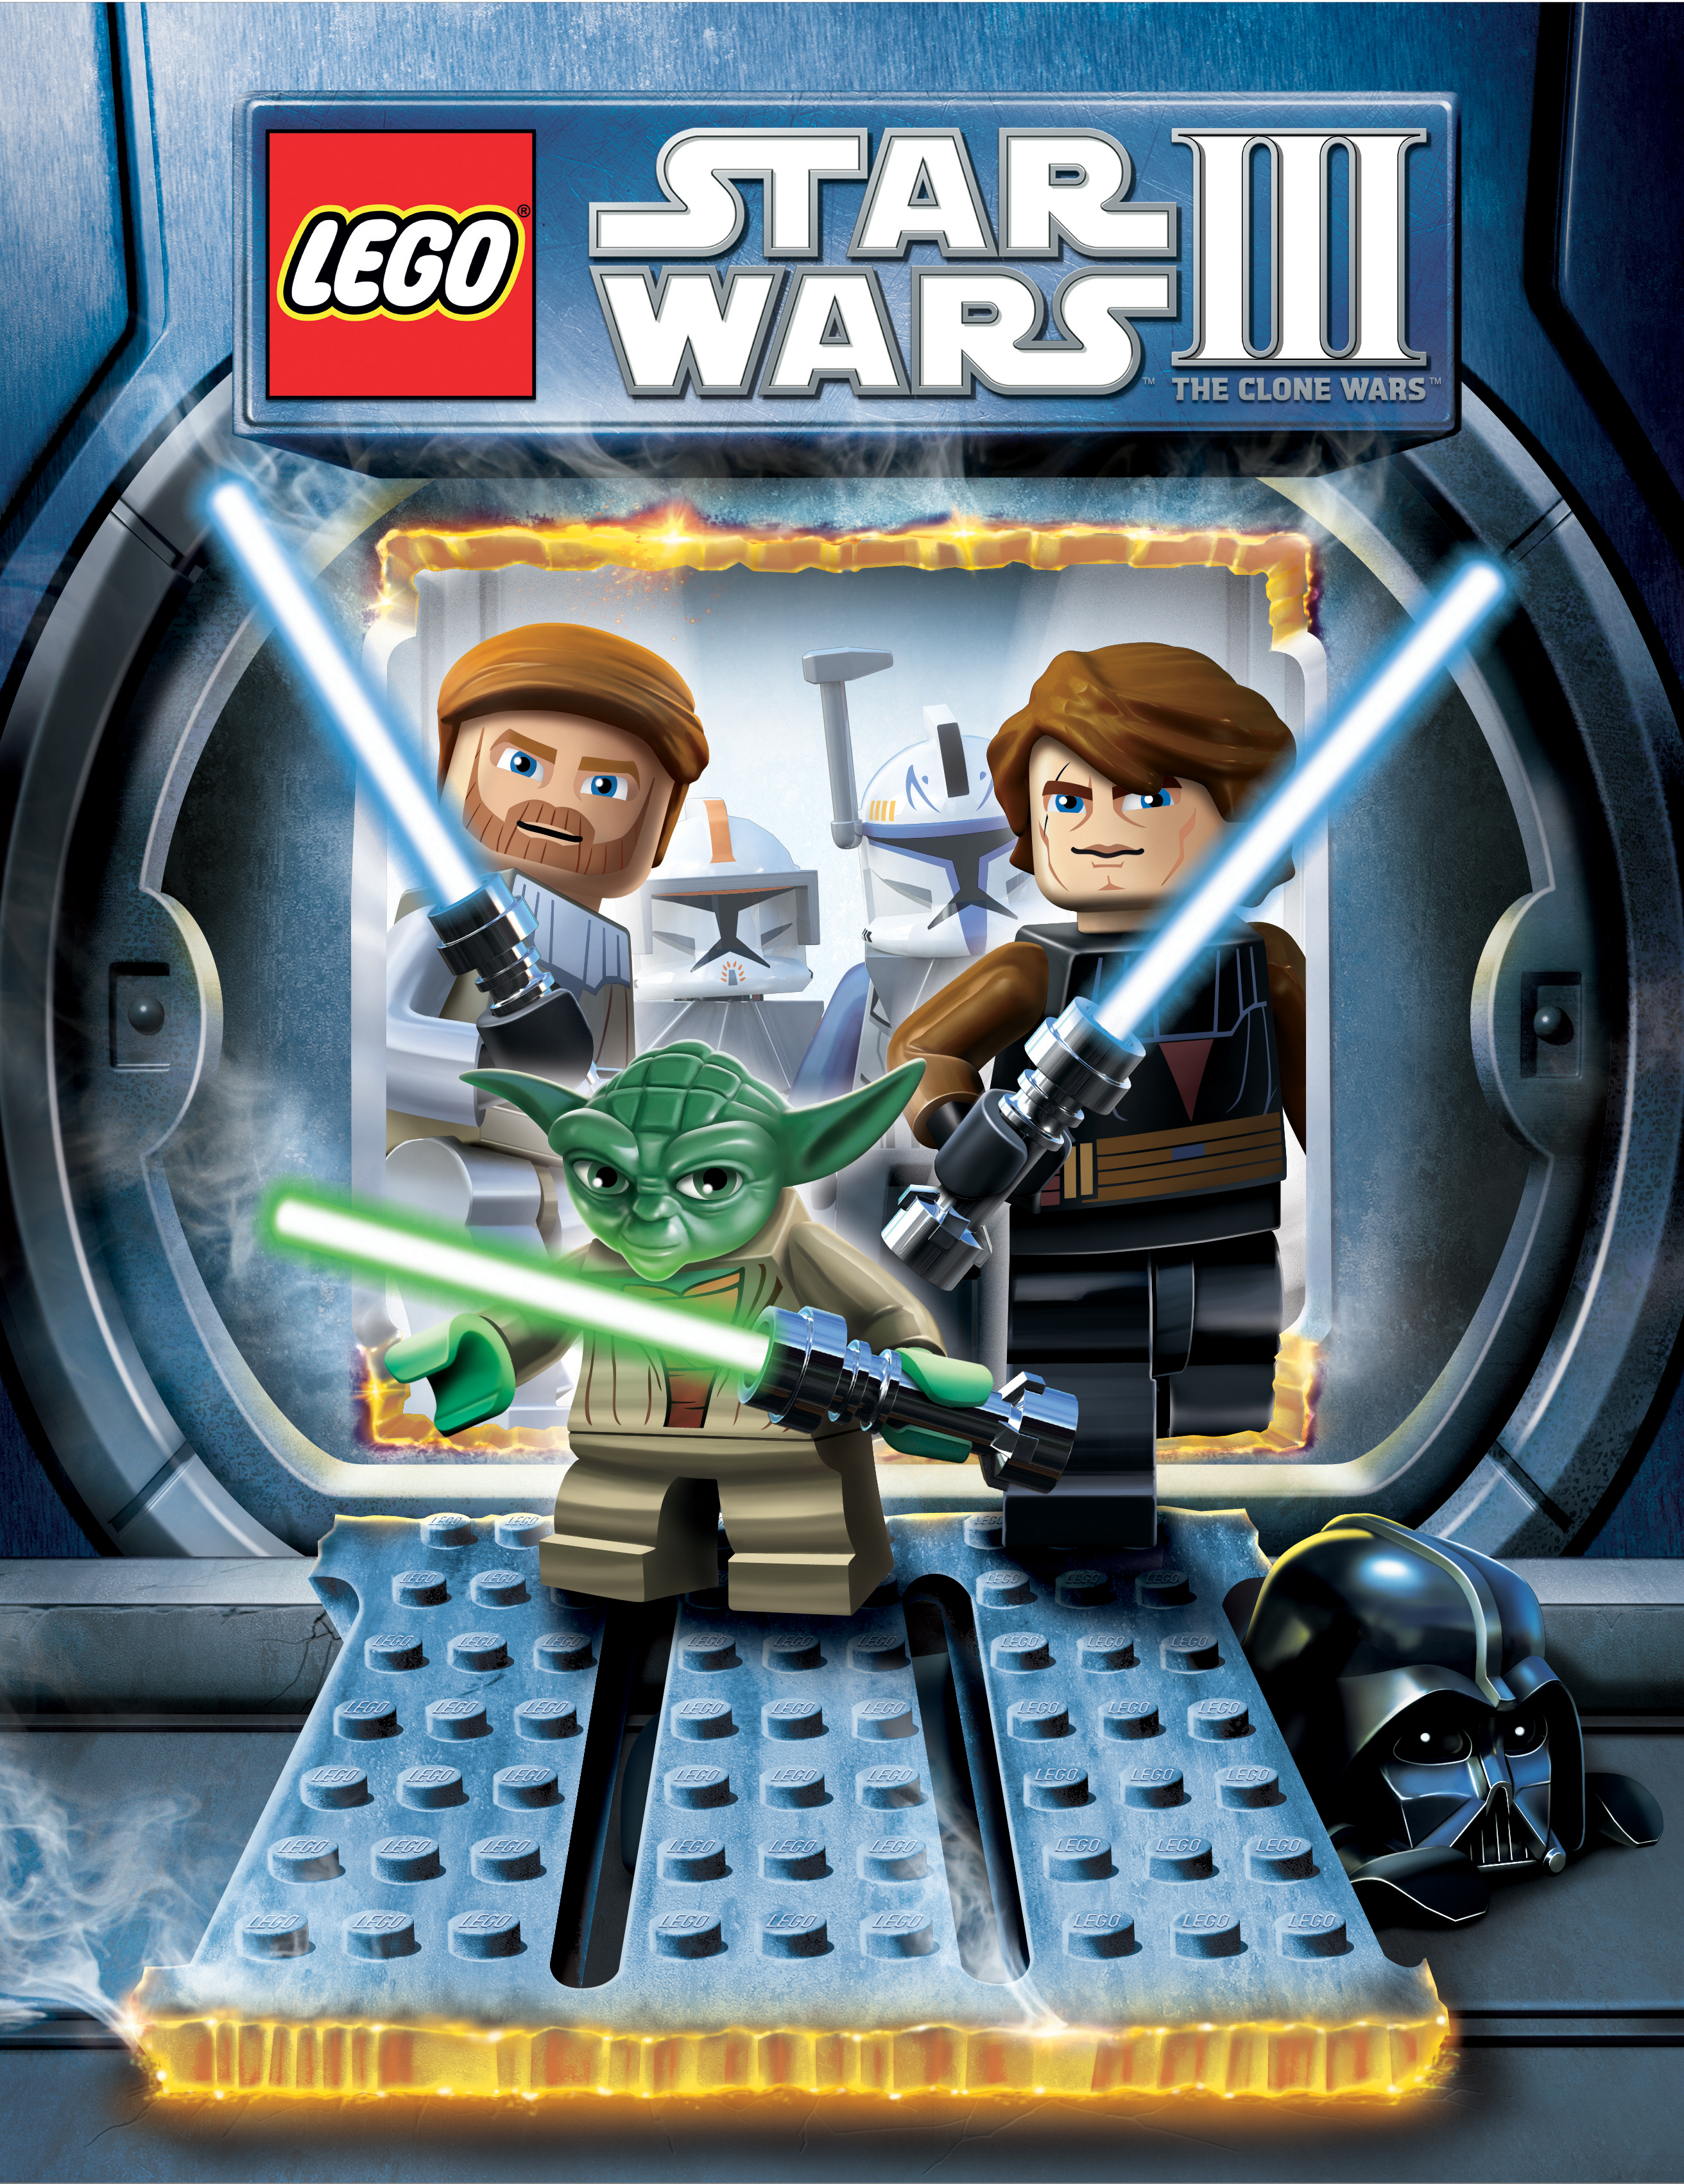 LEGO Star Wars III: The Clone Wars - Star Wars Wiki